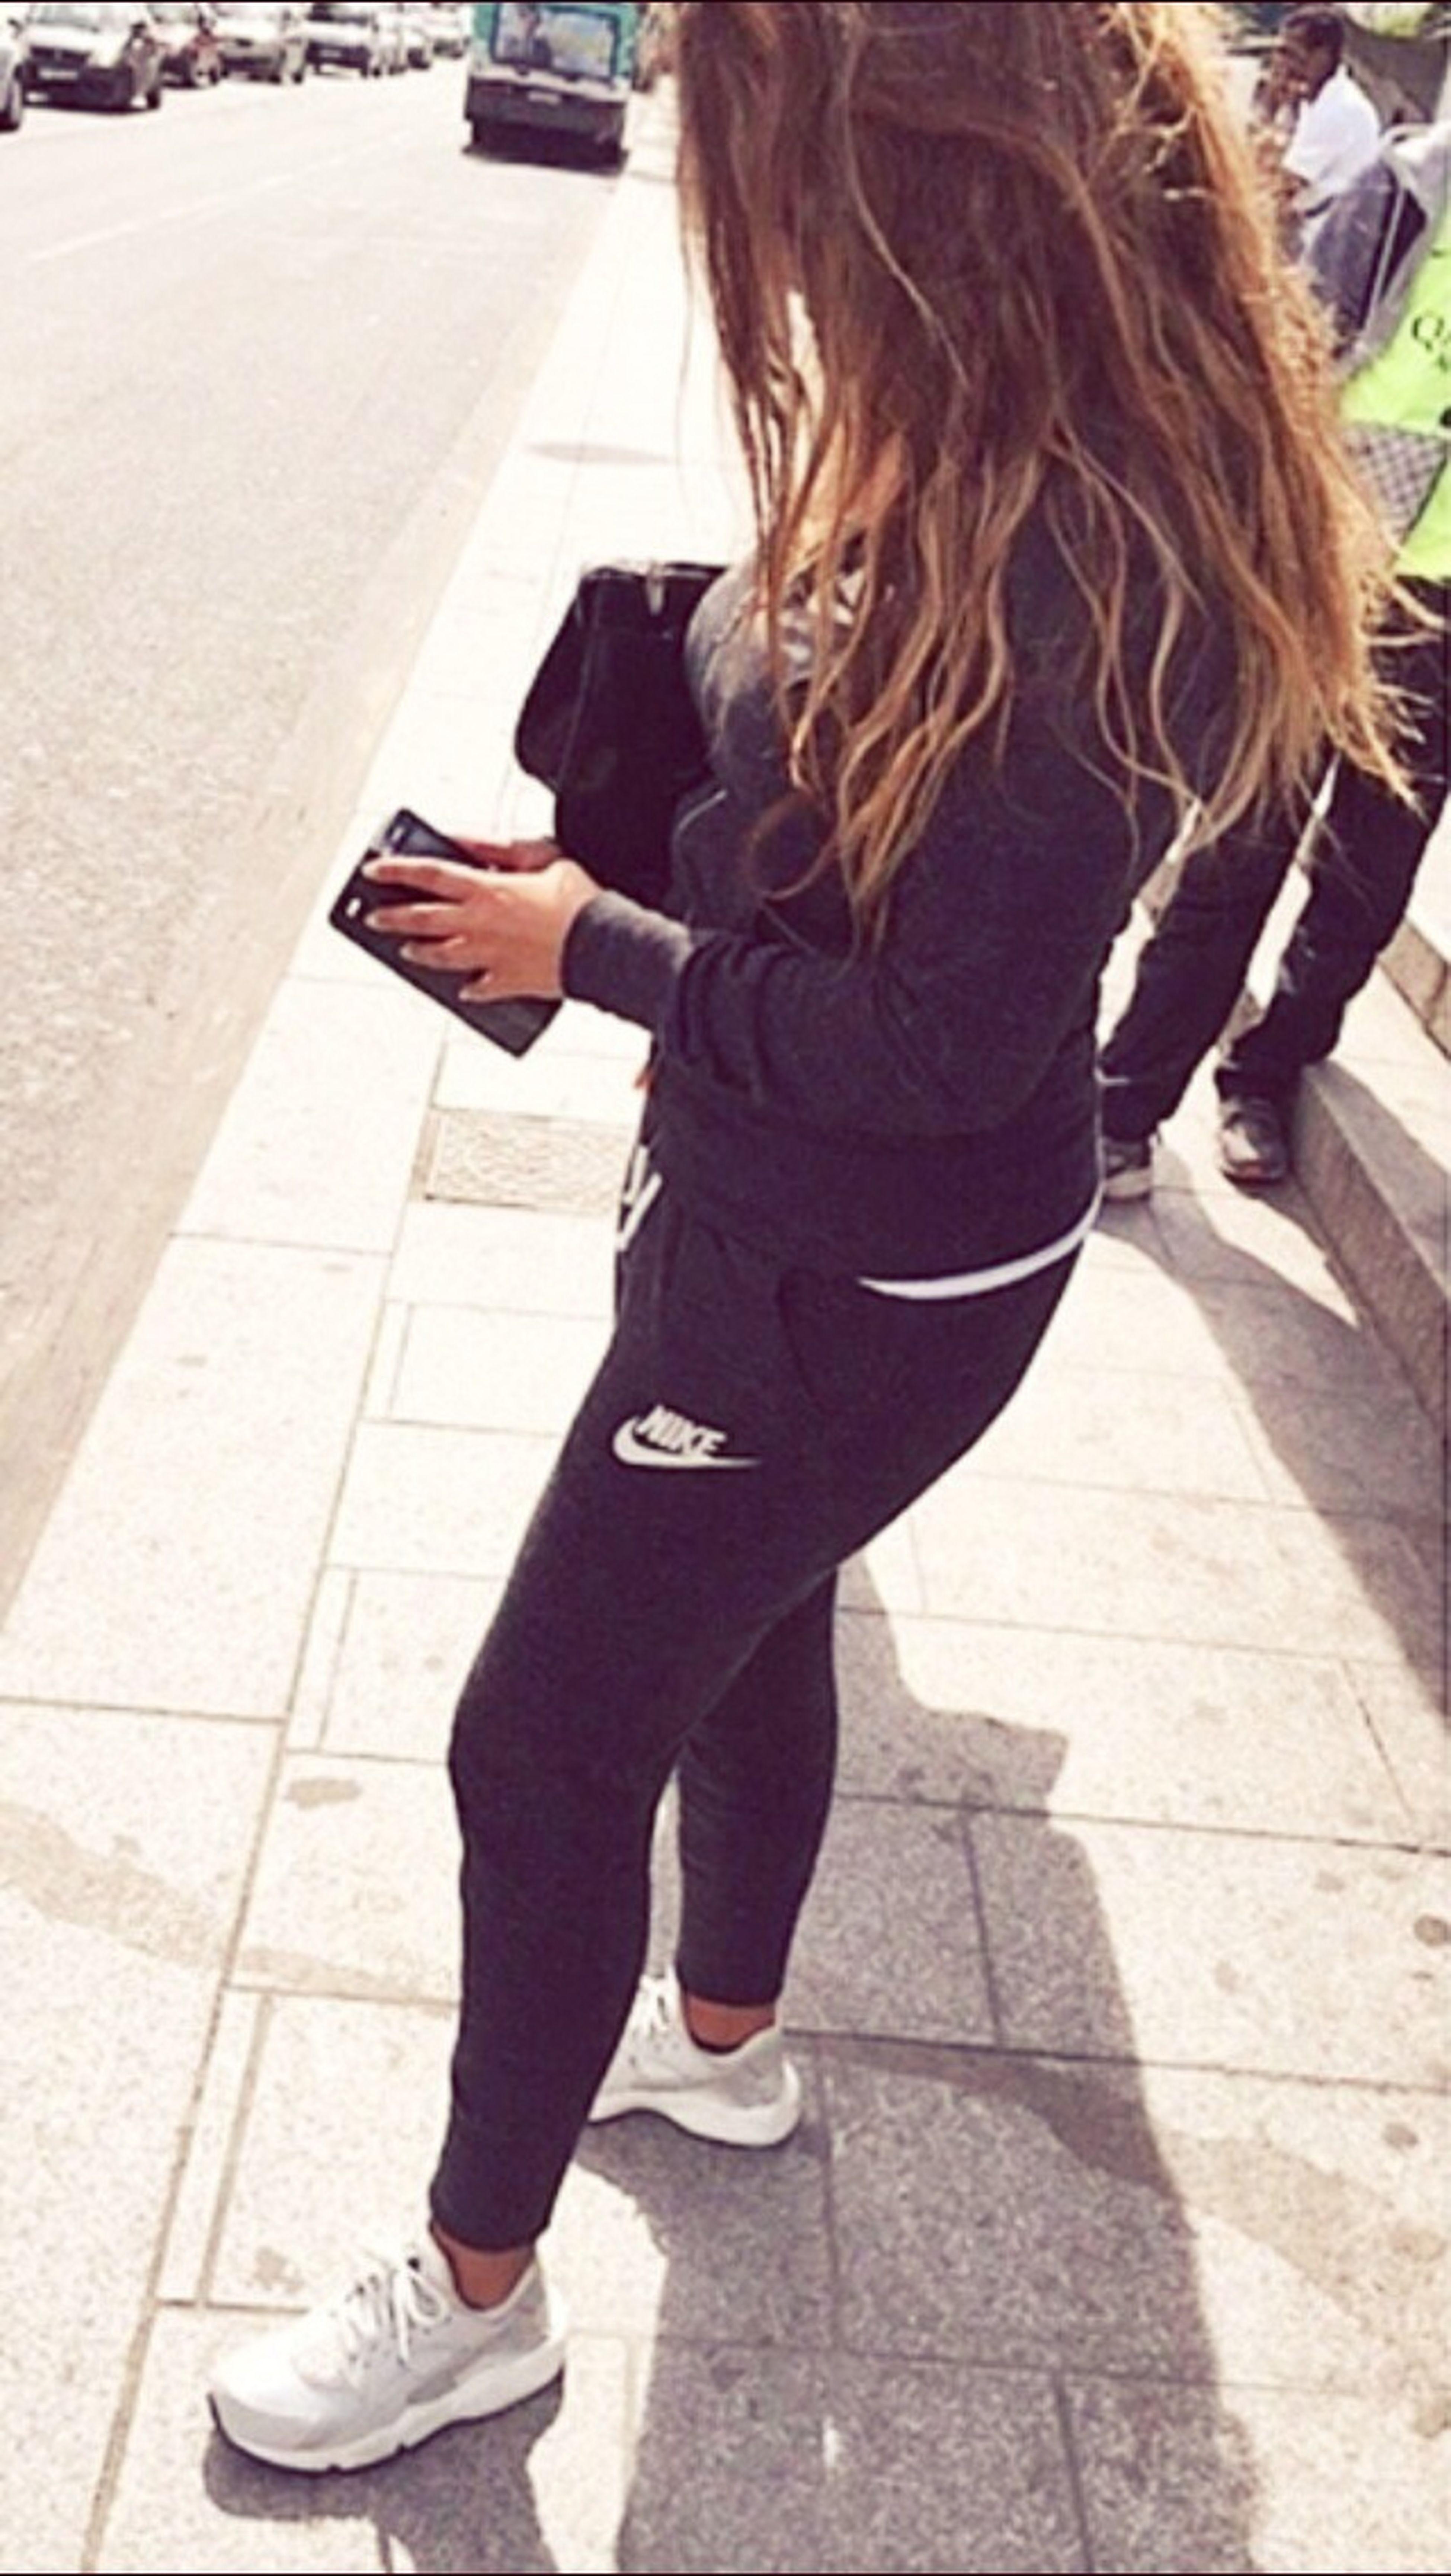 C'est qu'un rêve Jsuis dans mon lit Fashion Streetphotography Nike That's Me Girl Beautiful Day Sun Enjoying Life EyeEm Best Shots